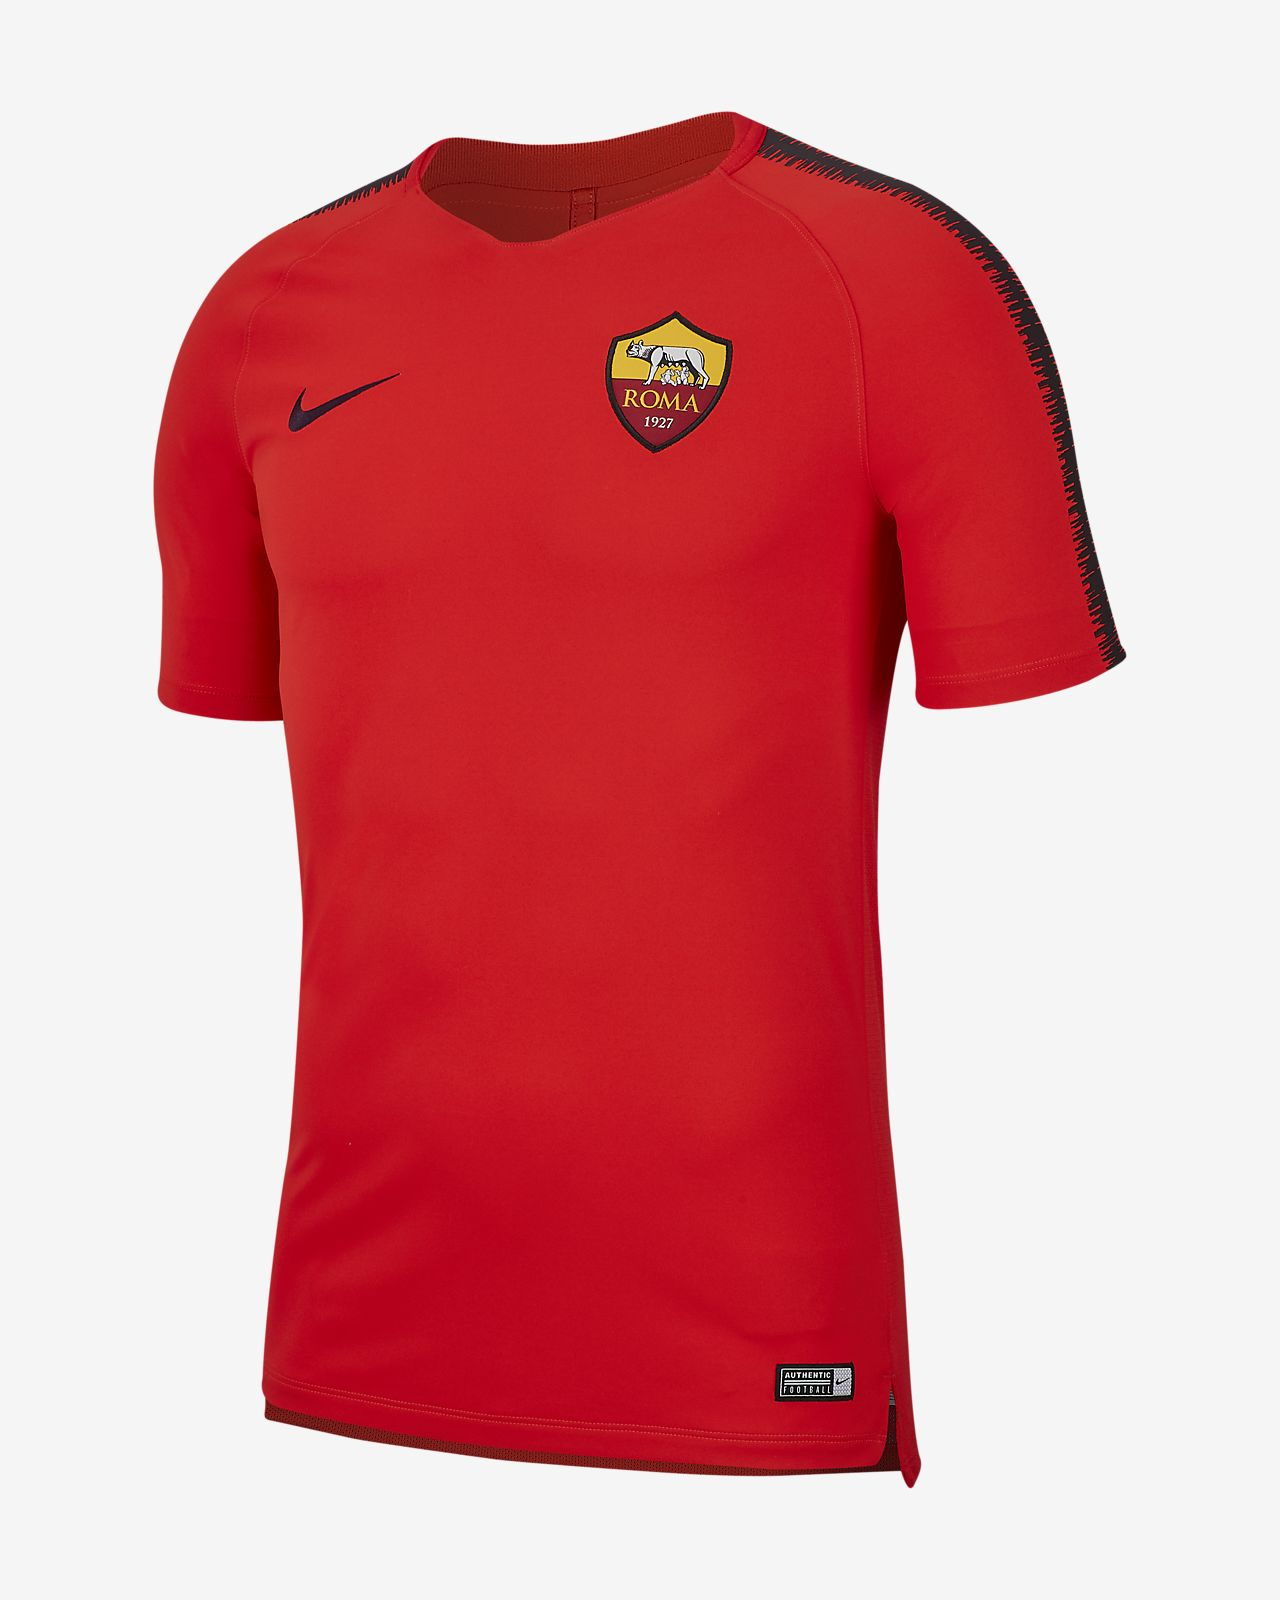 A.S. Roma Breathe Squad Camiseta de fútbol - Hombre